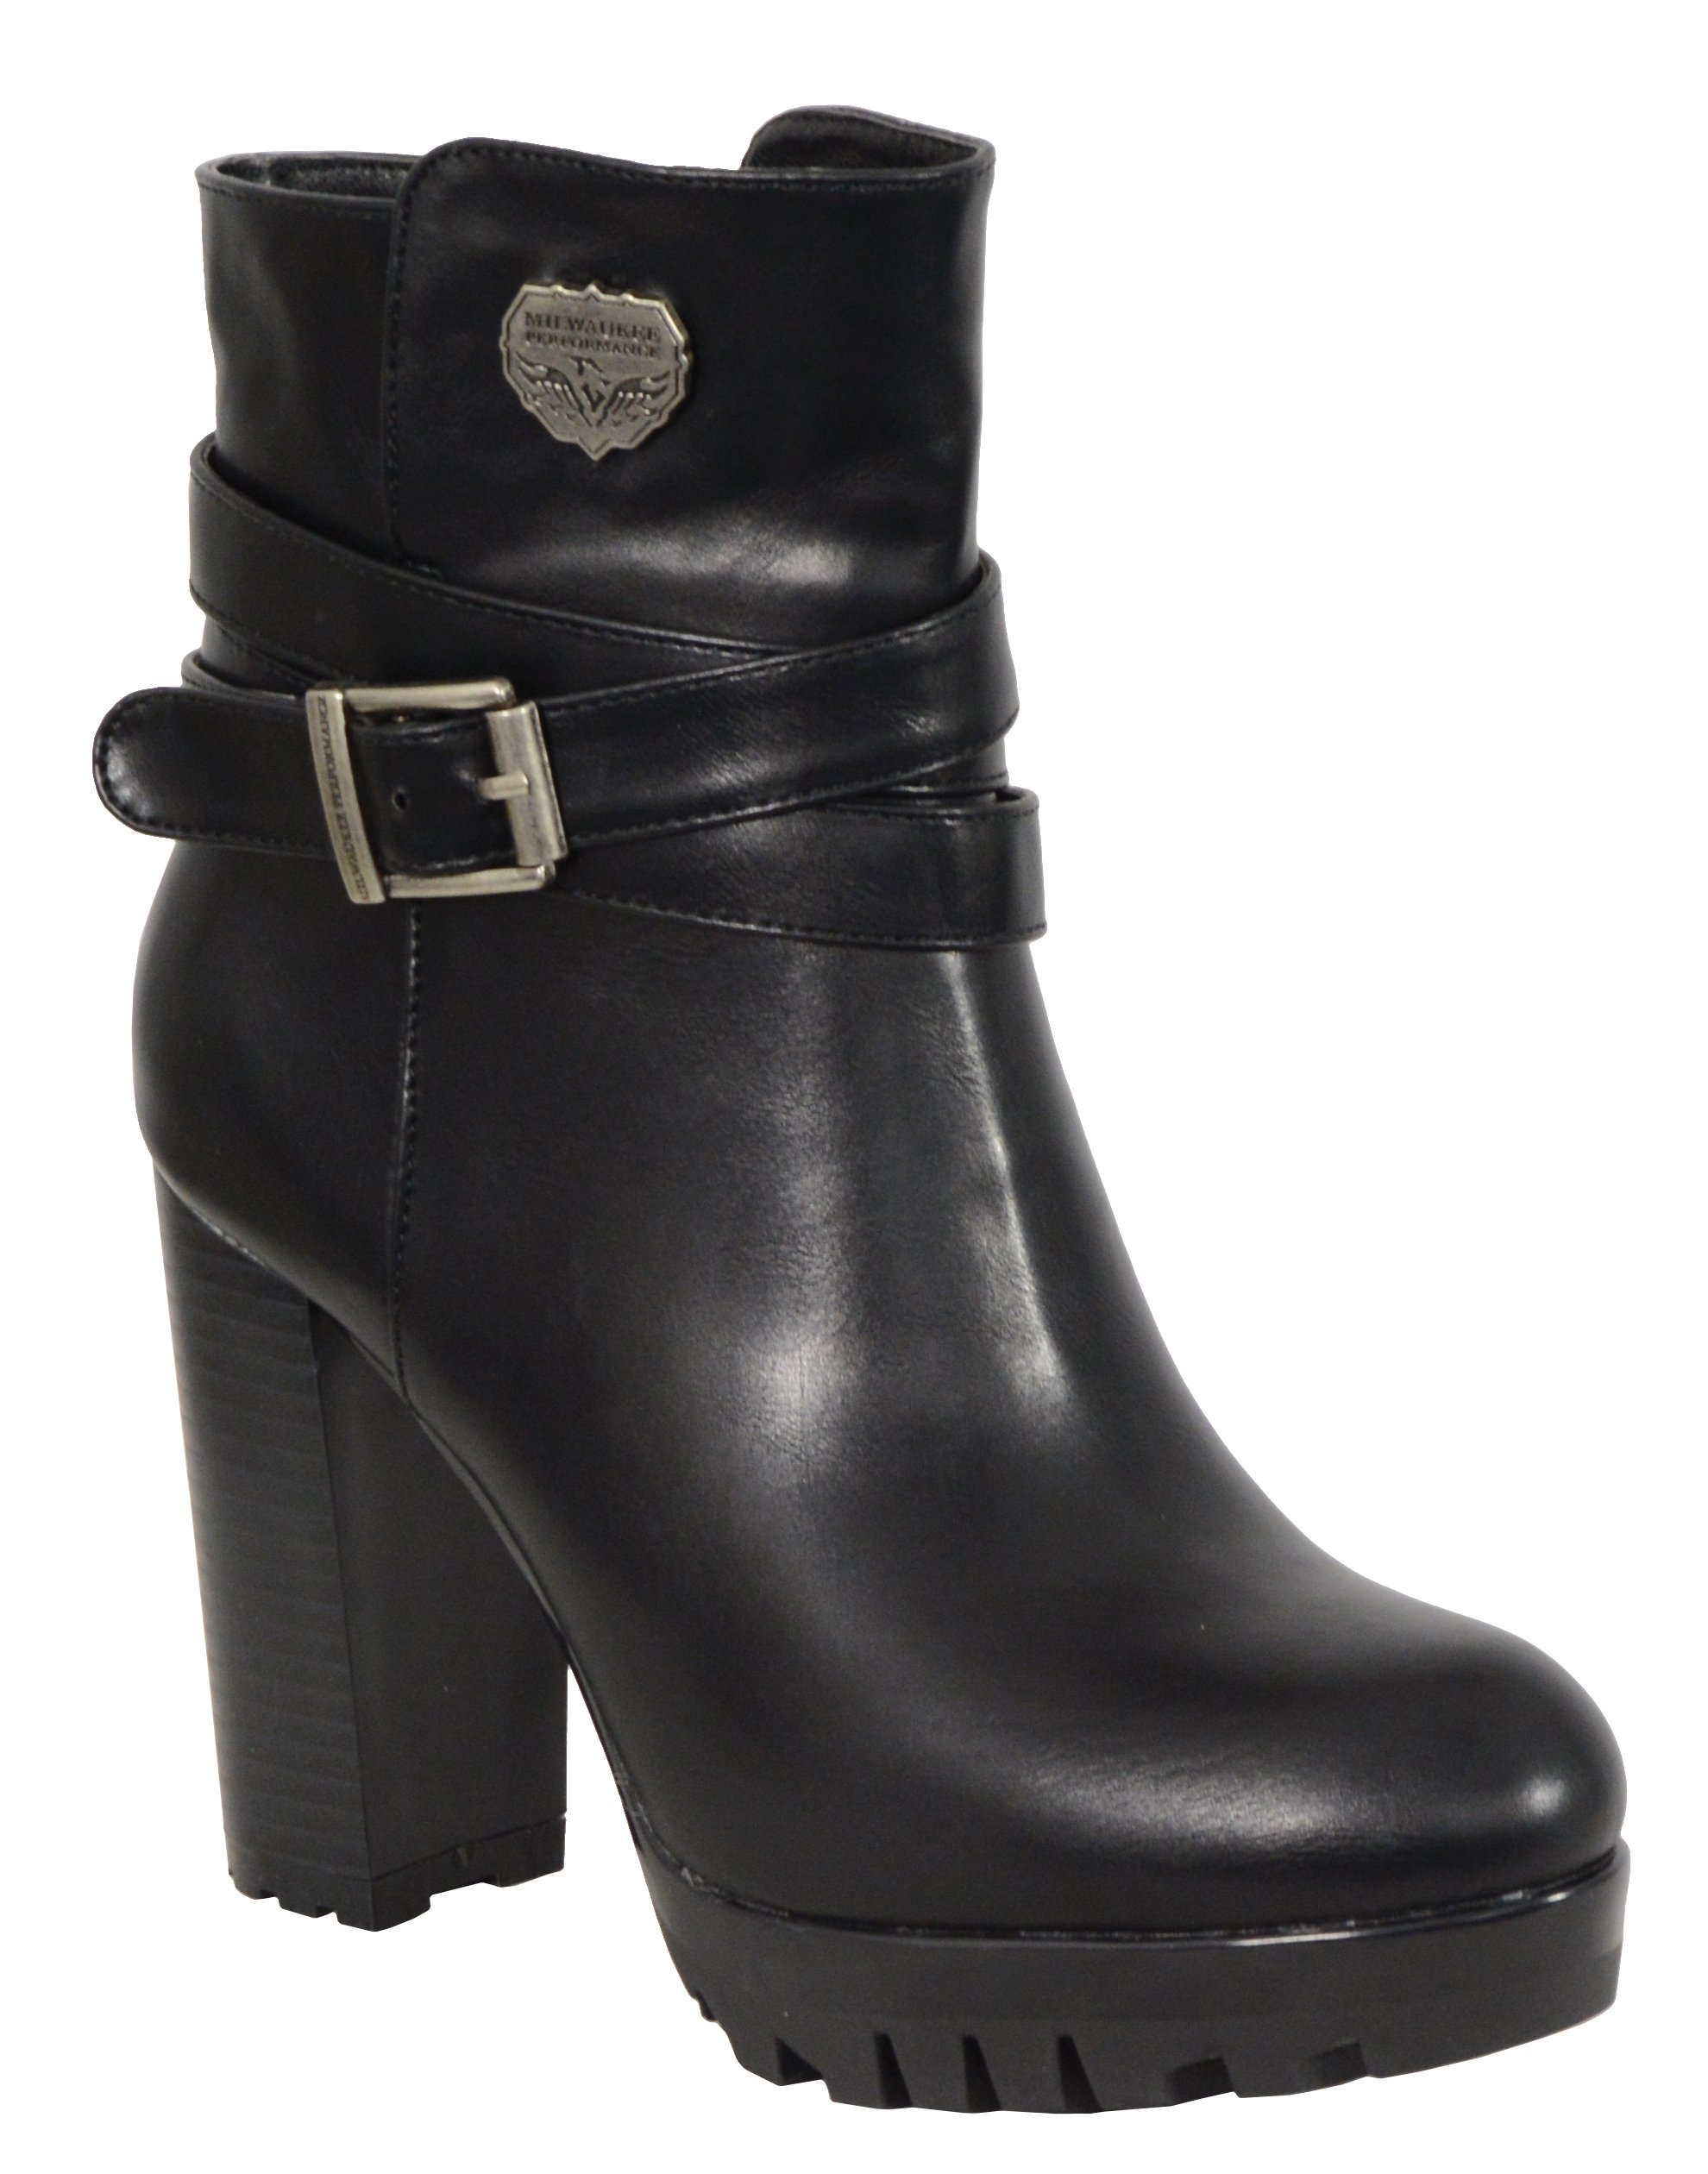 Milwaukee Performance Women's Black Double Strap Side Zipper Boots (Black, Size 6)